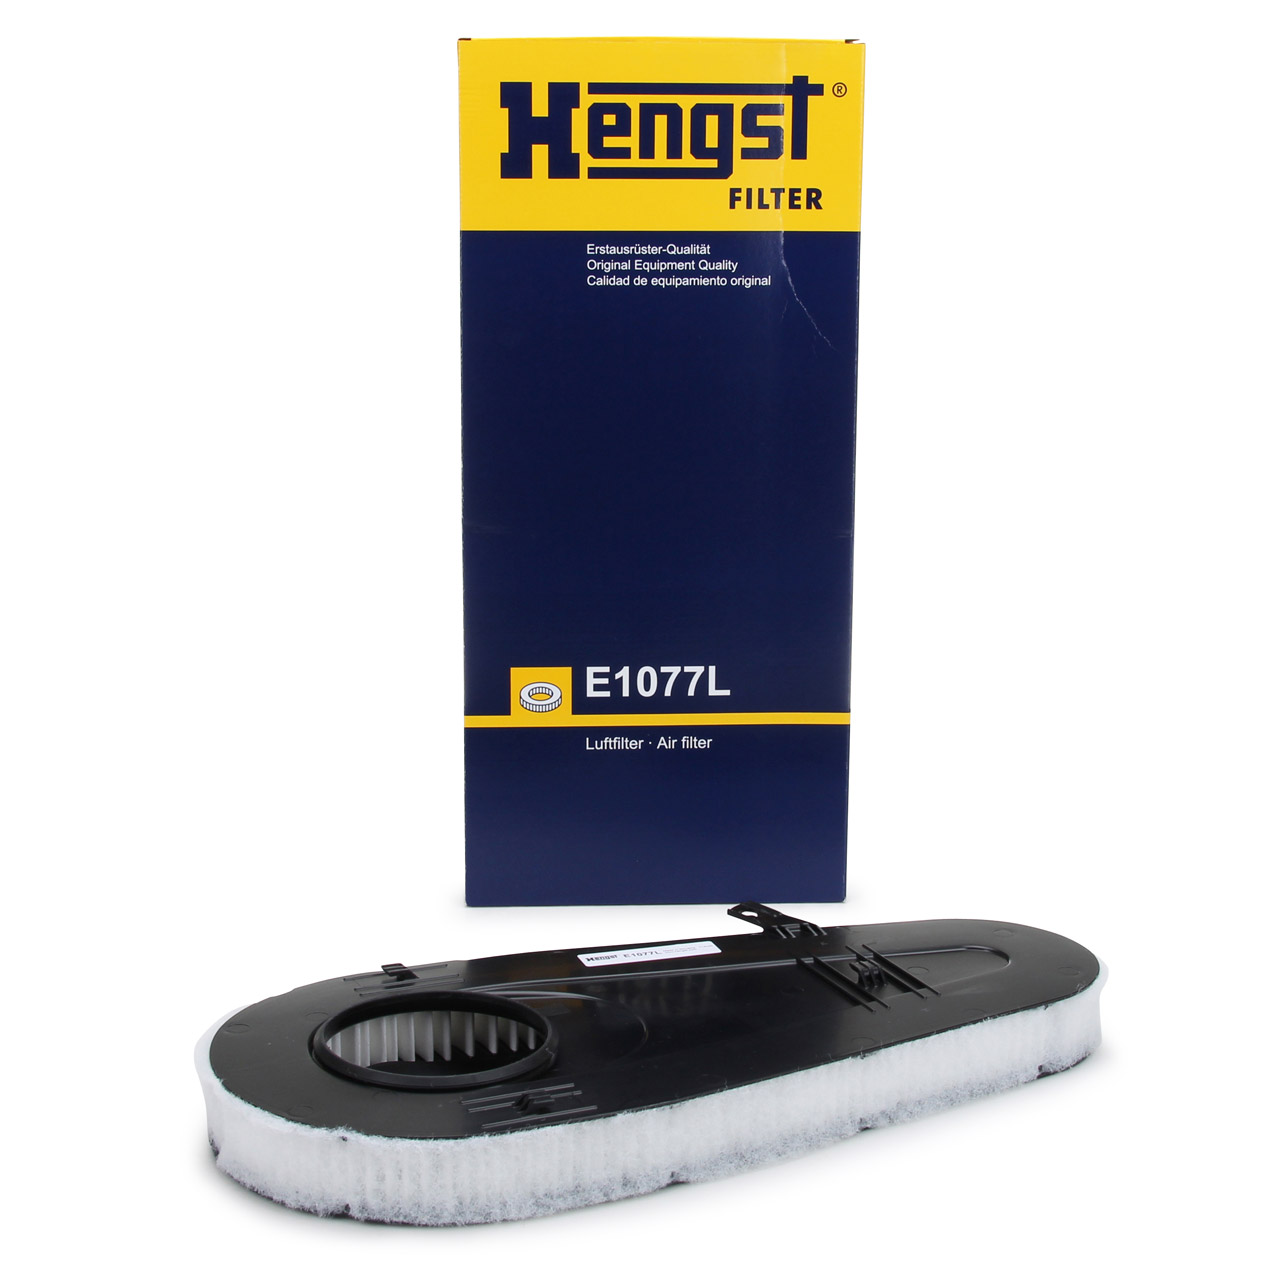 HENGST E1077L Luftfilter für BMW 5er F10 F11 F07 518-535d 7er F01-04 730d 740d